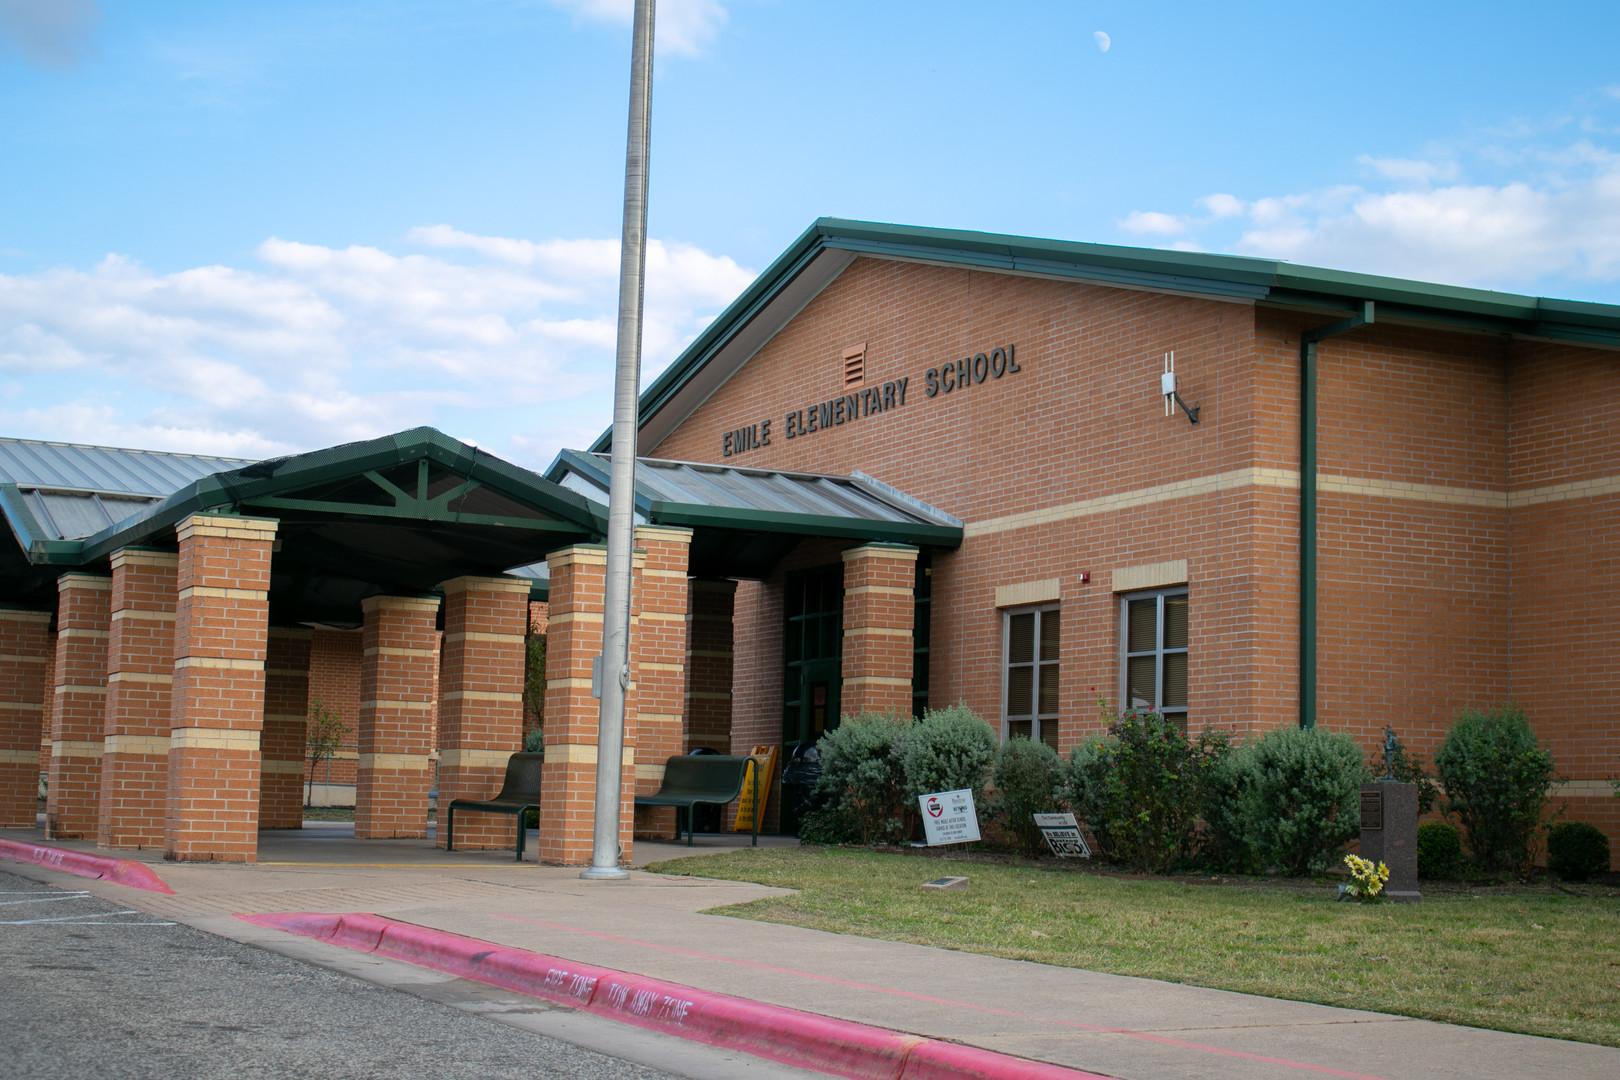 Emile Elementary School